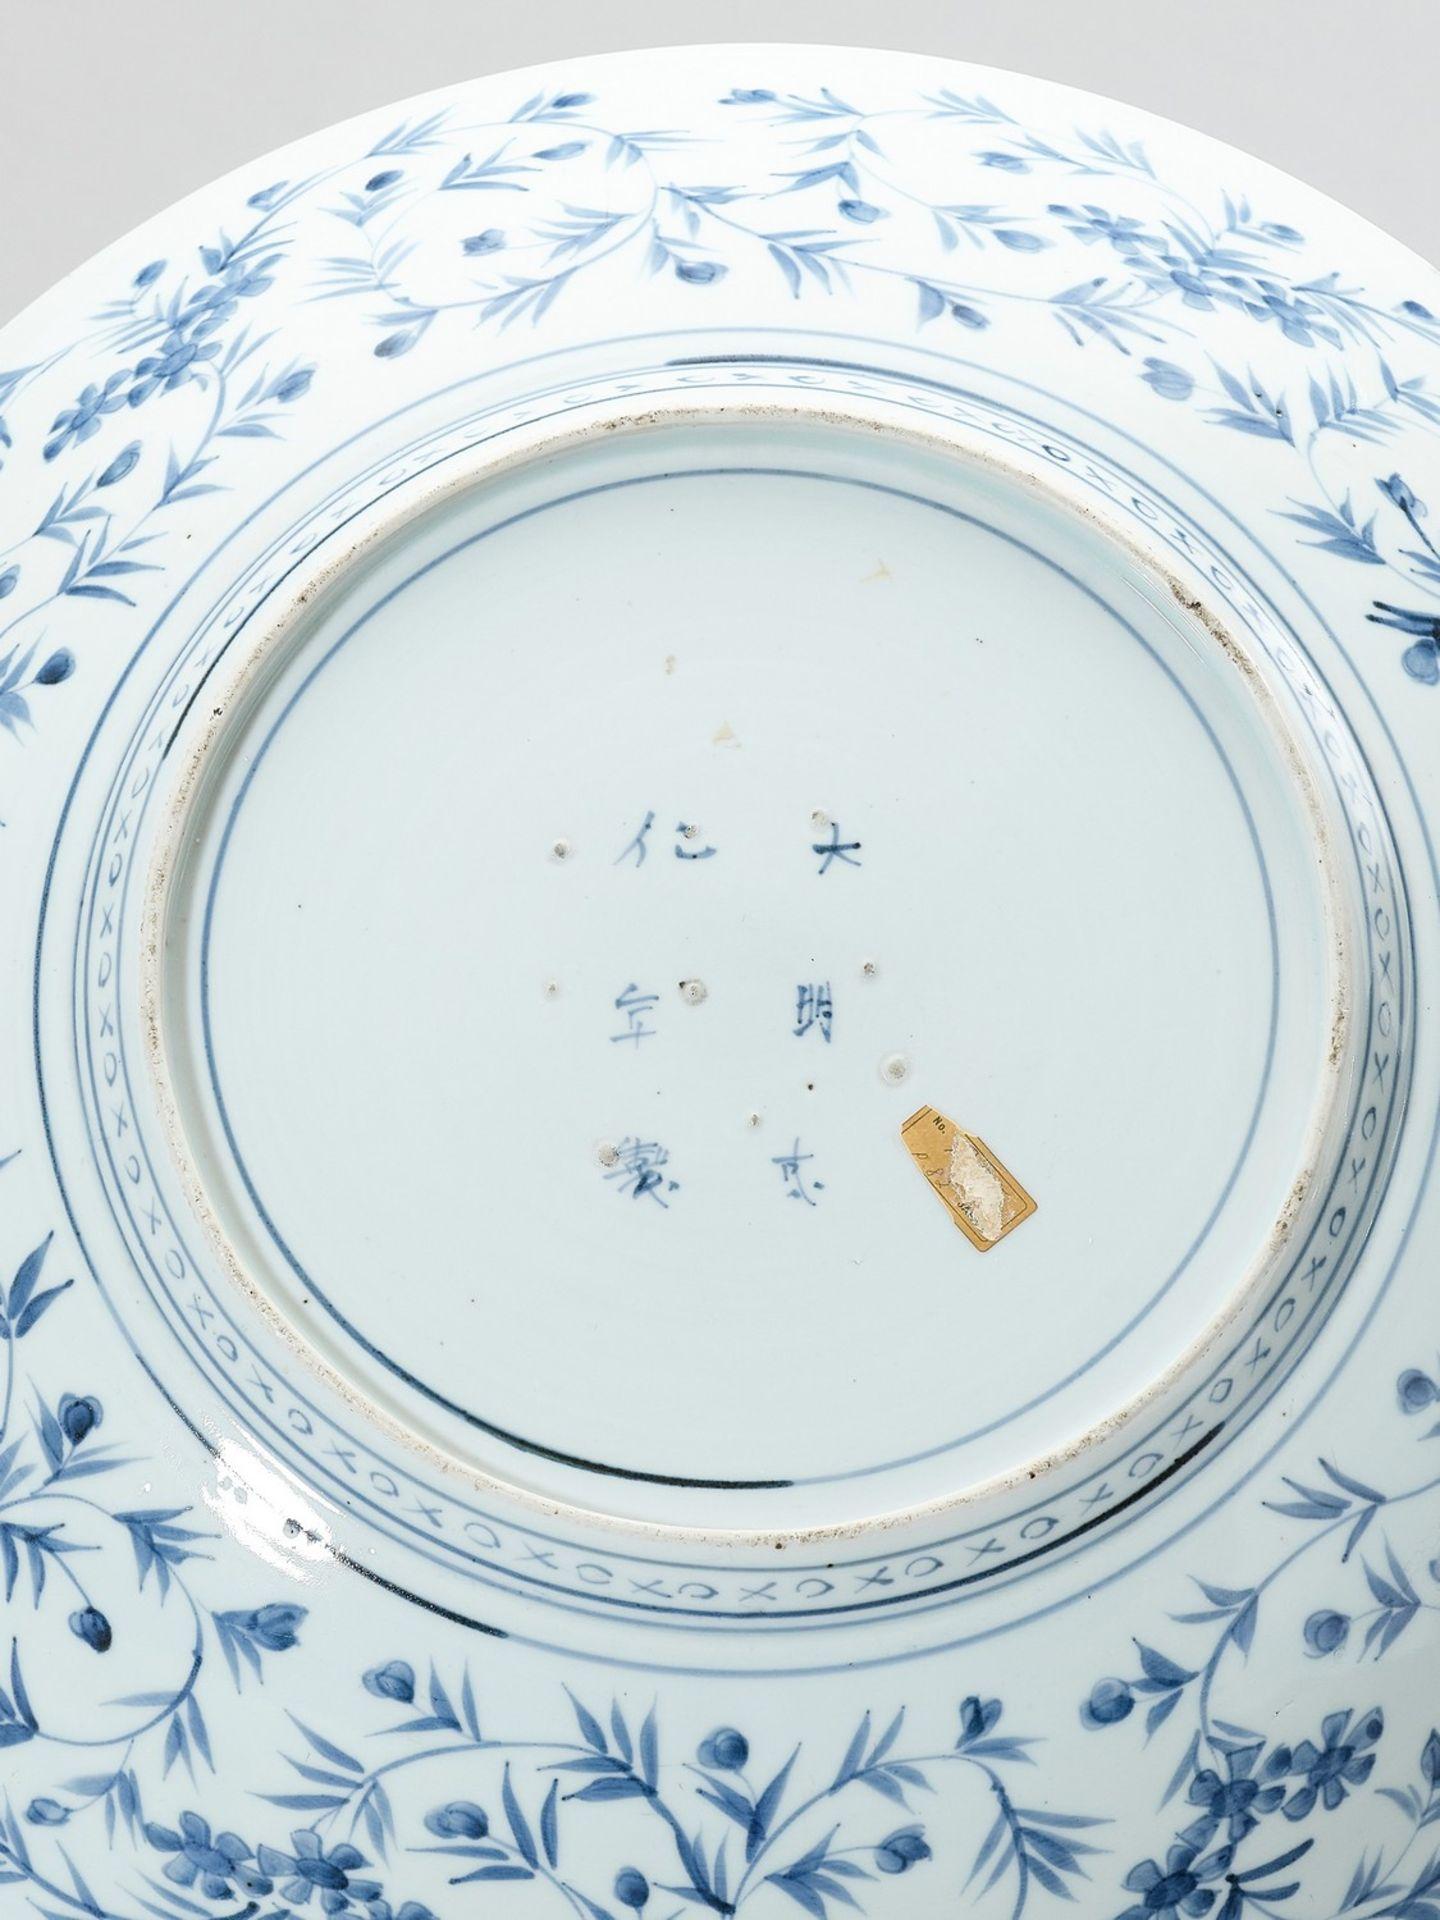 A BLUE AND WHITE ARITA PORCELAIN CHARGER - Bild 5 aus 5